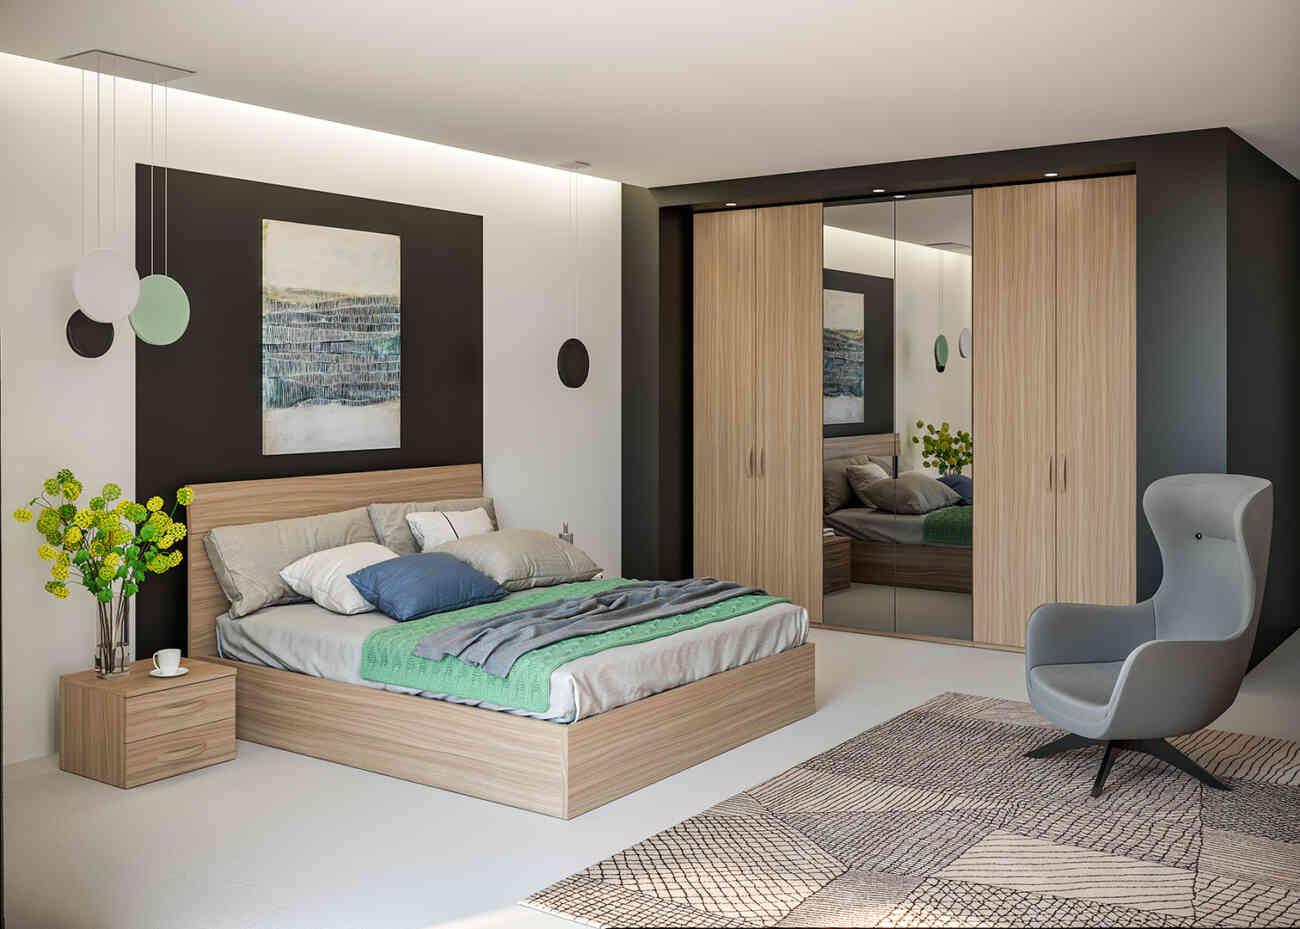 Camera da letto CM271 - Giessegi - Gruppo Inventa ...